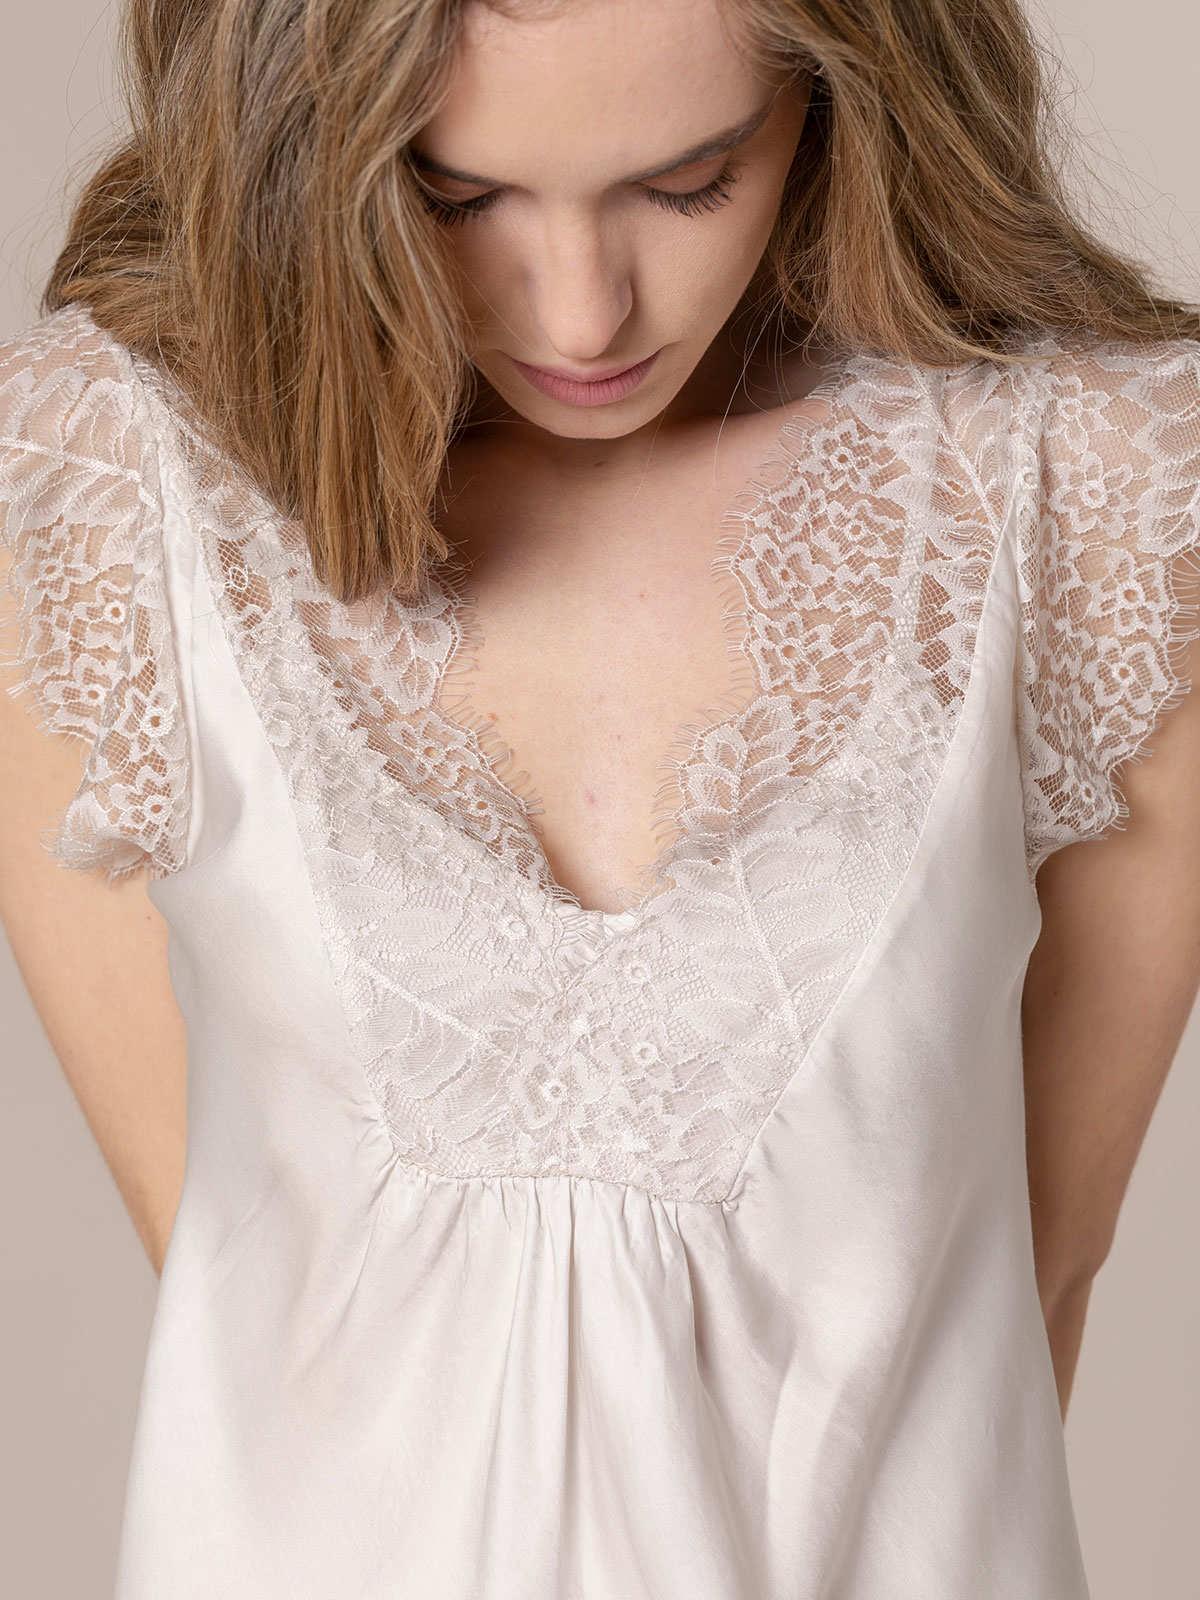 Top mujer lencero con crochet Beige